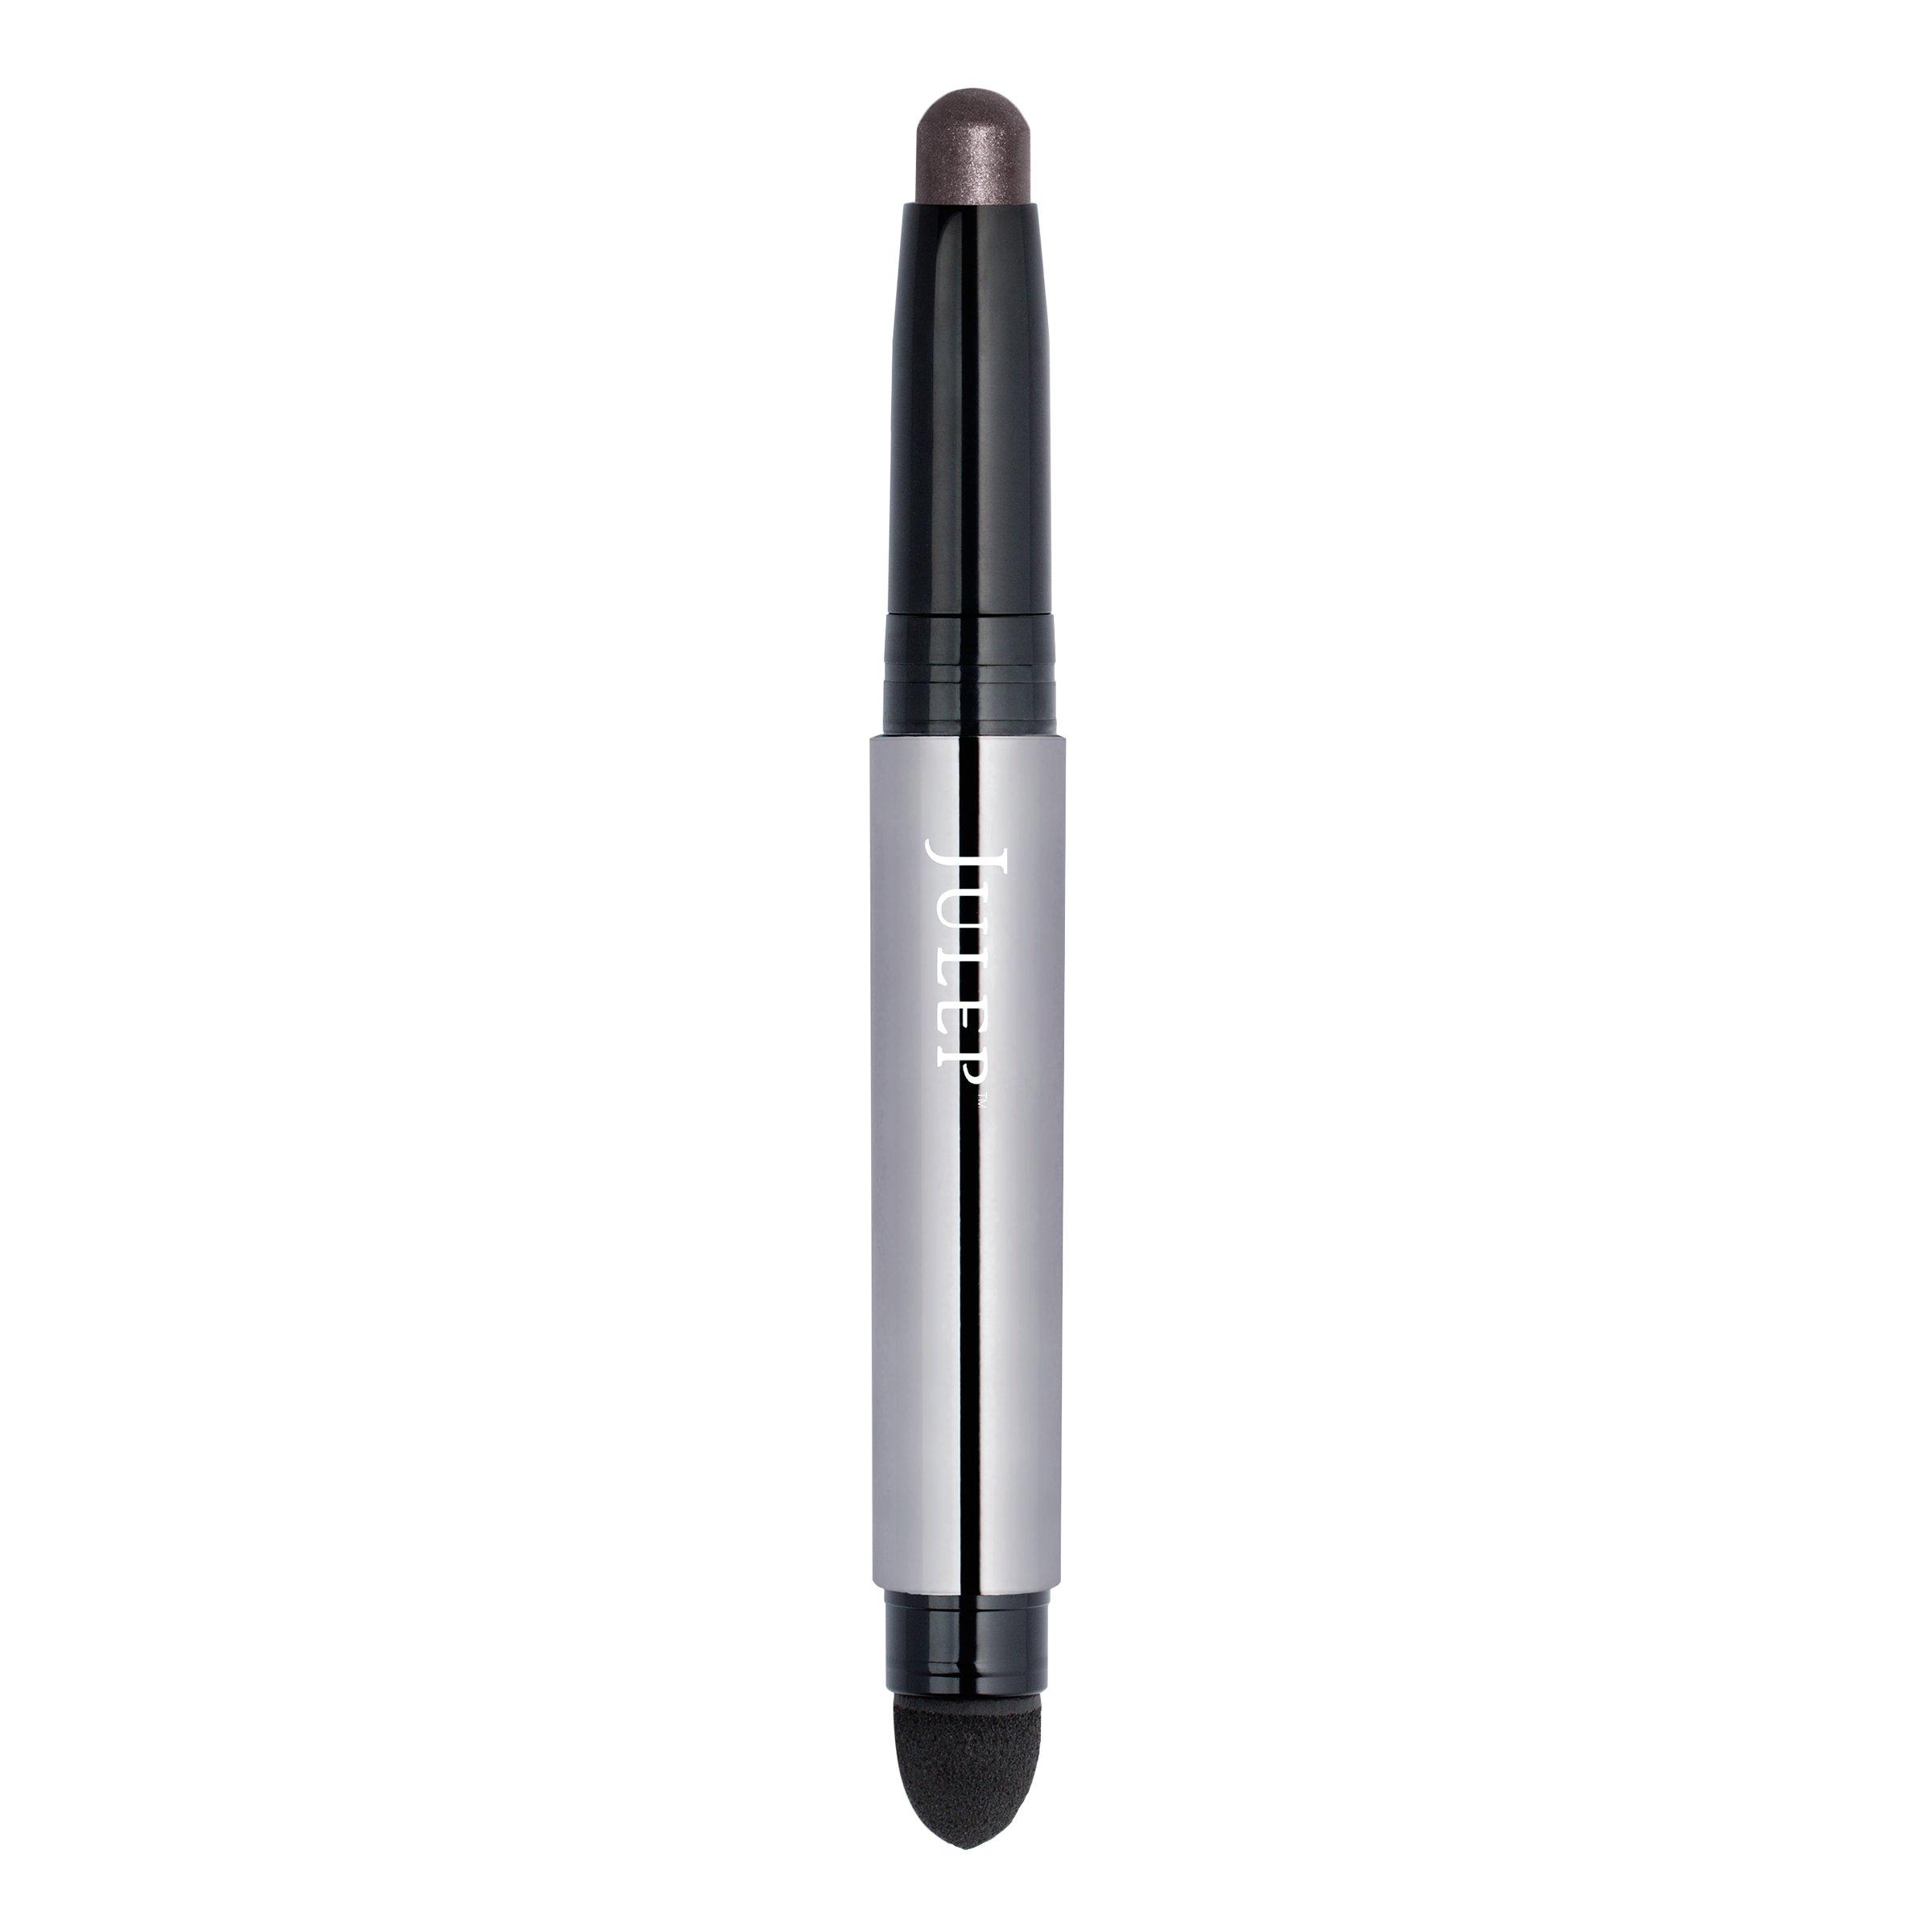 Julep Eyeshadow 101 Crème to Powder Waterproof Eyeshadow Stick, Slate Shimmer